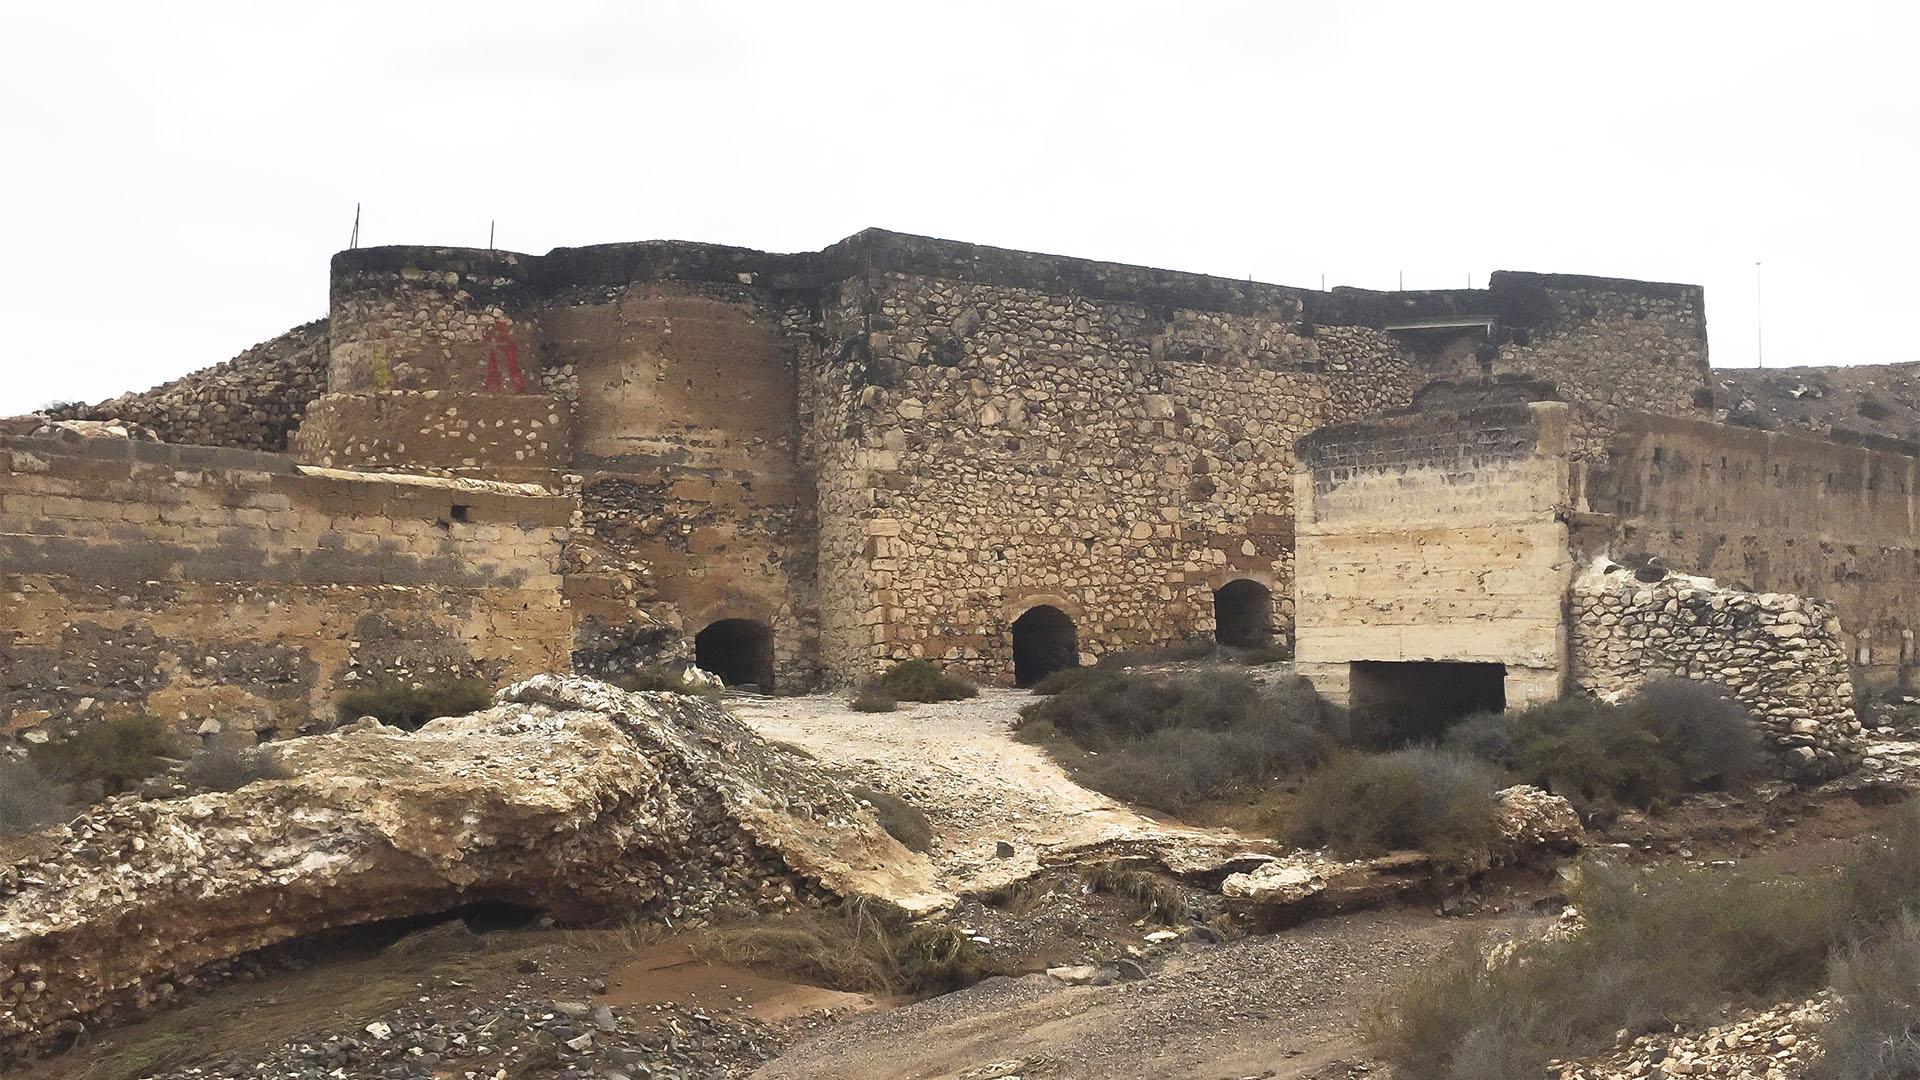 Die mächtigen historischen Kalköfen im Barranco Hondo westlich von Puerto del Rosario Fuerteventura.